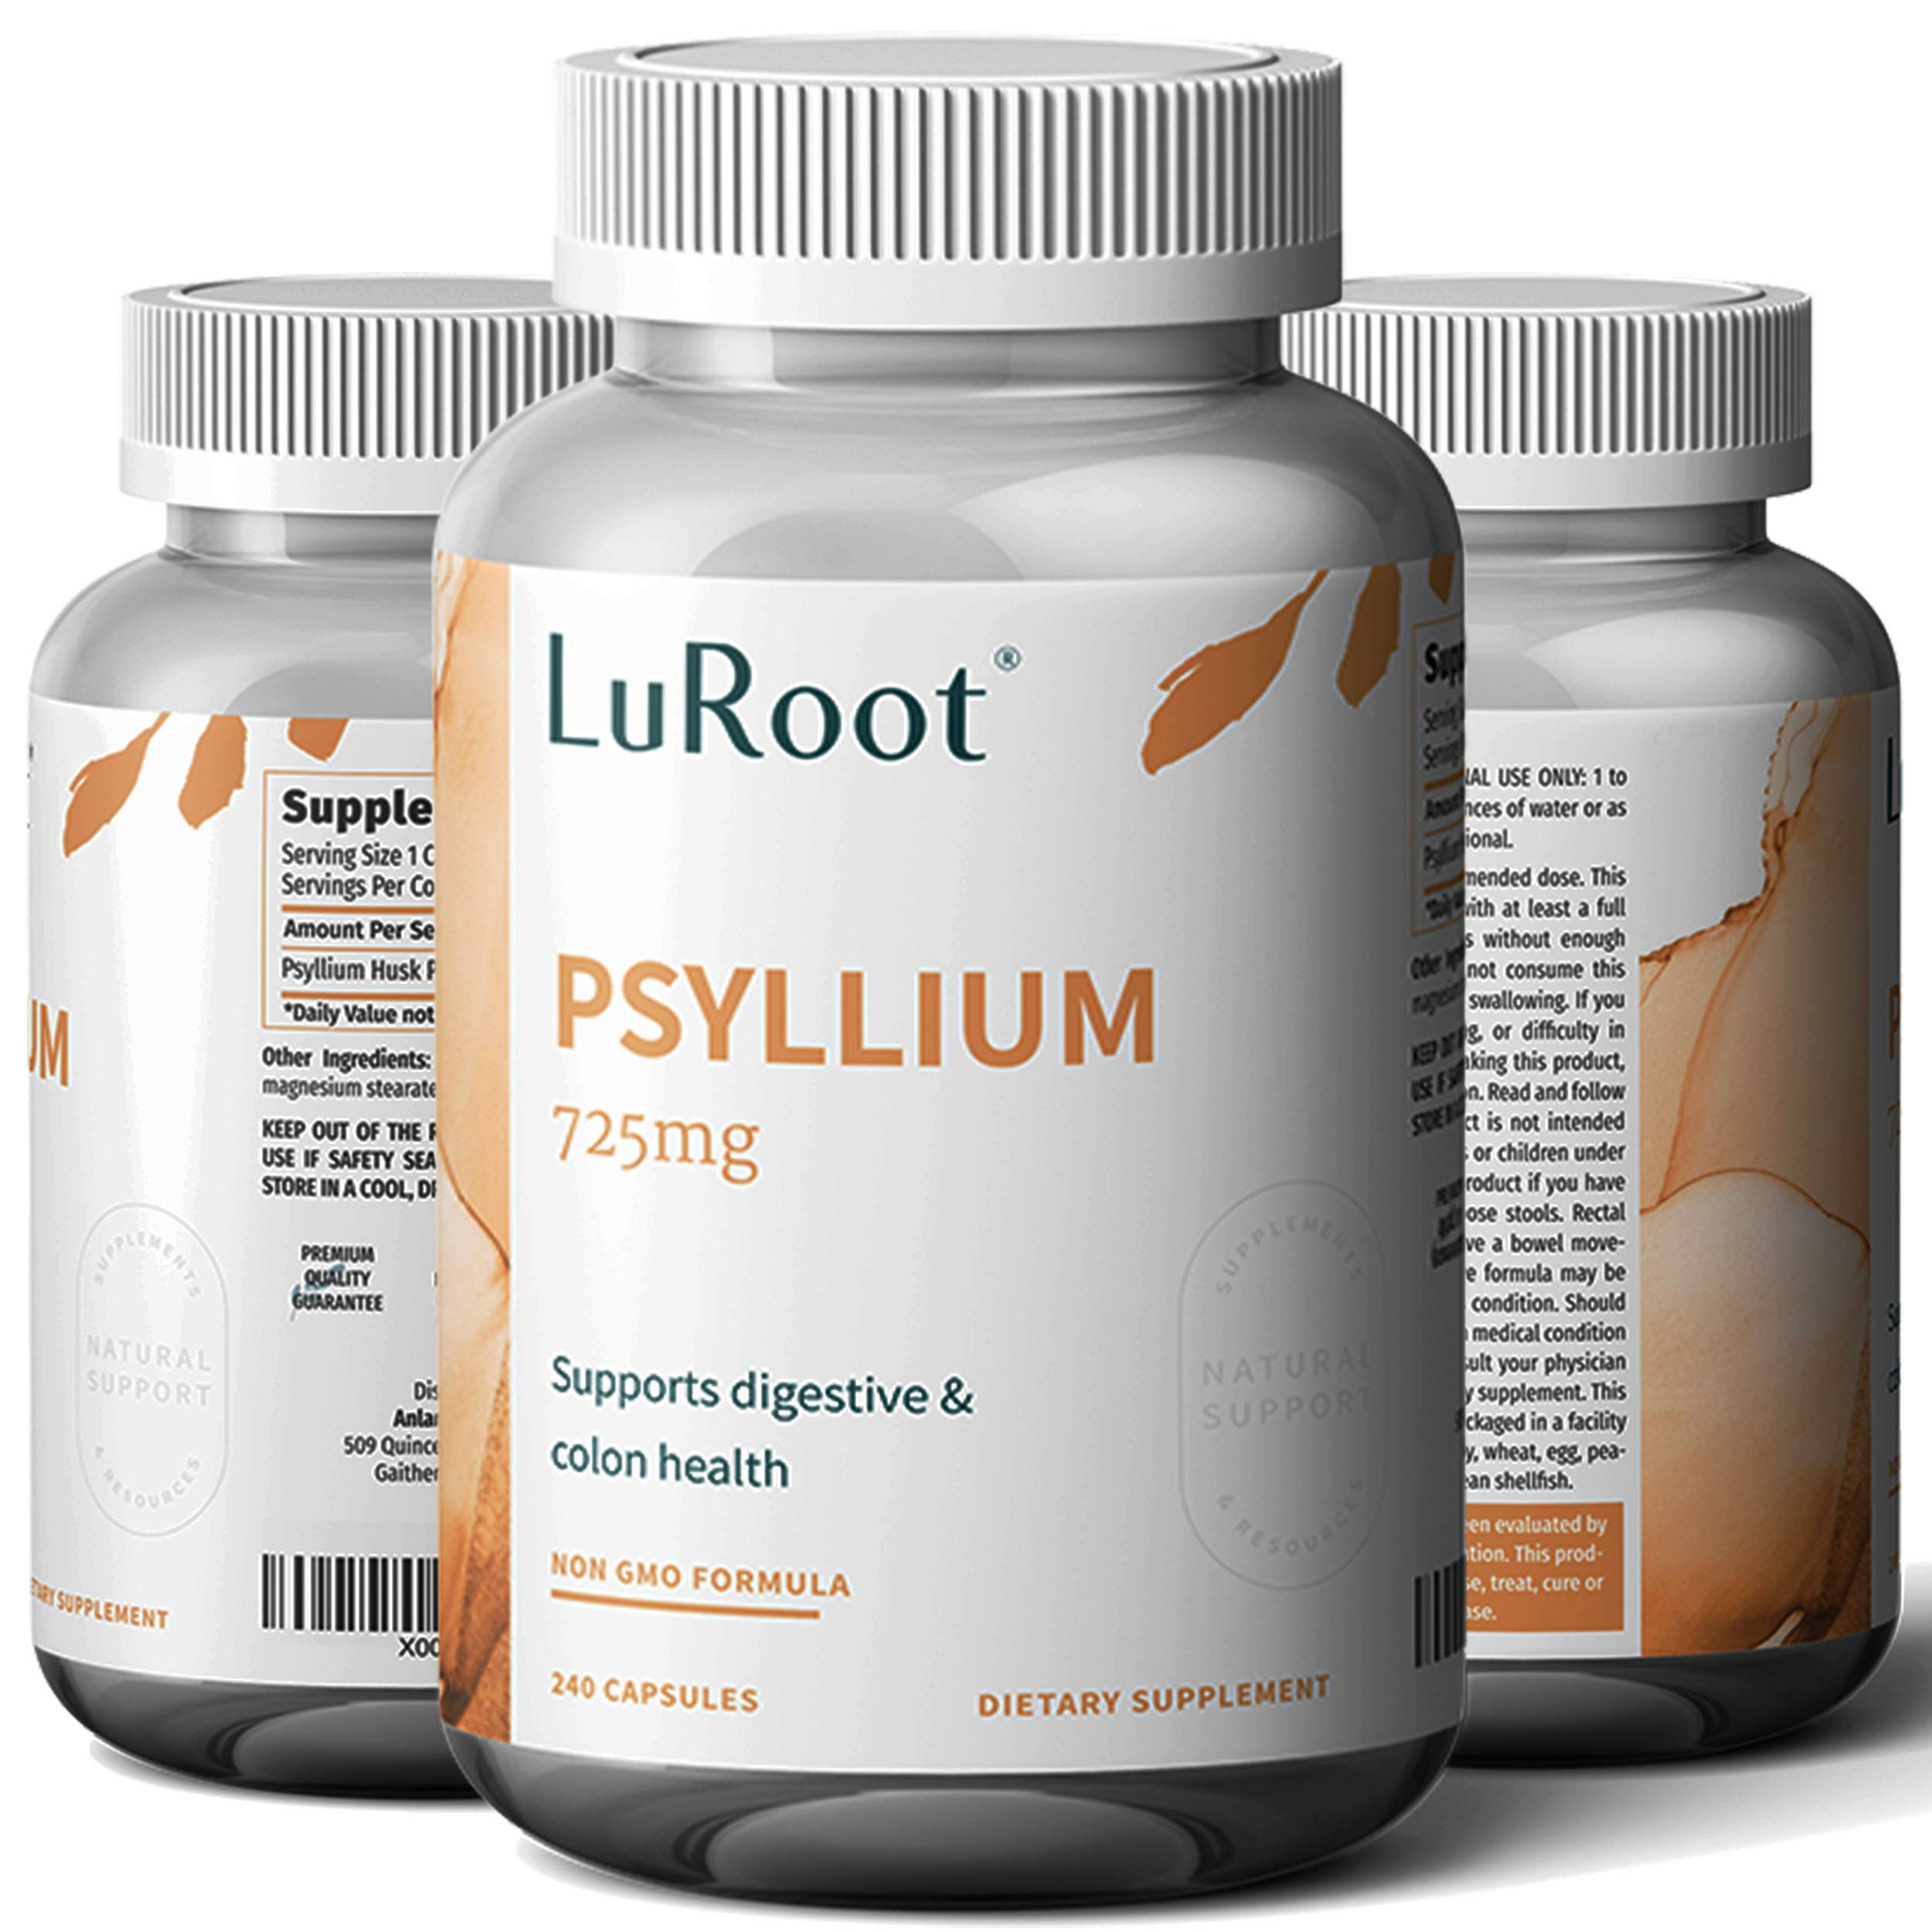 Psyllium Husk Seed Powder Capsules, 240 Capsules - 725 mg per Serving, Made with Organic Non-GMO & Gluten Free psyllium Husk - Soluble Fiber Supplement by LuRoot (Pack 1)